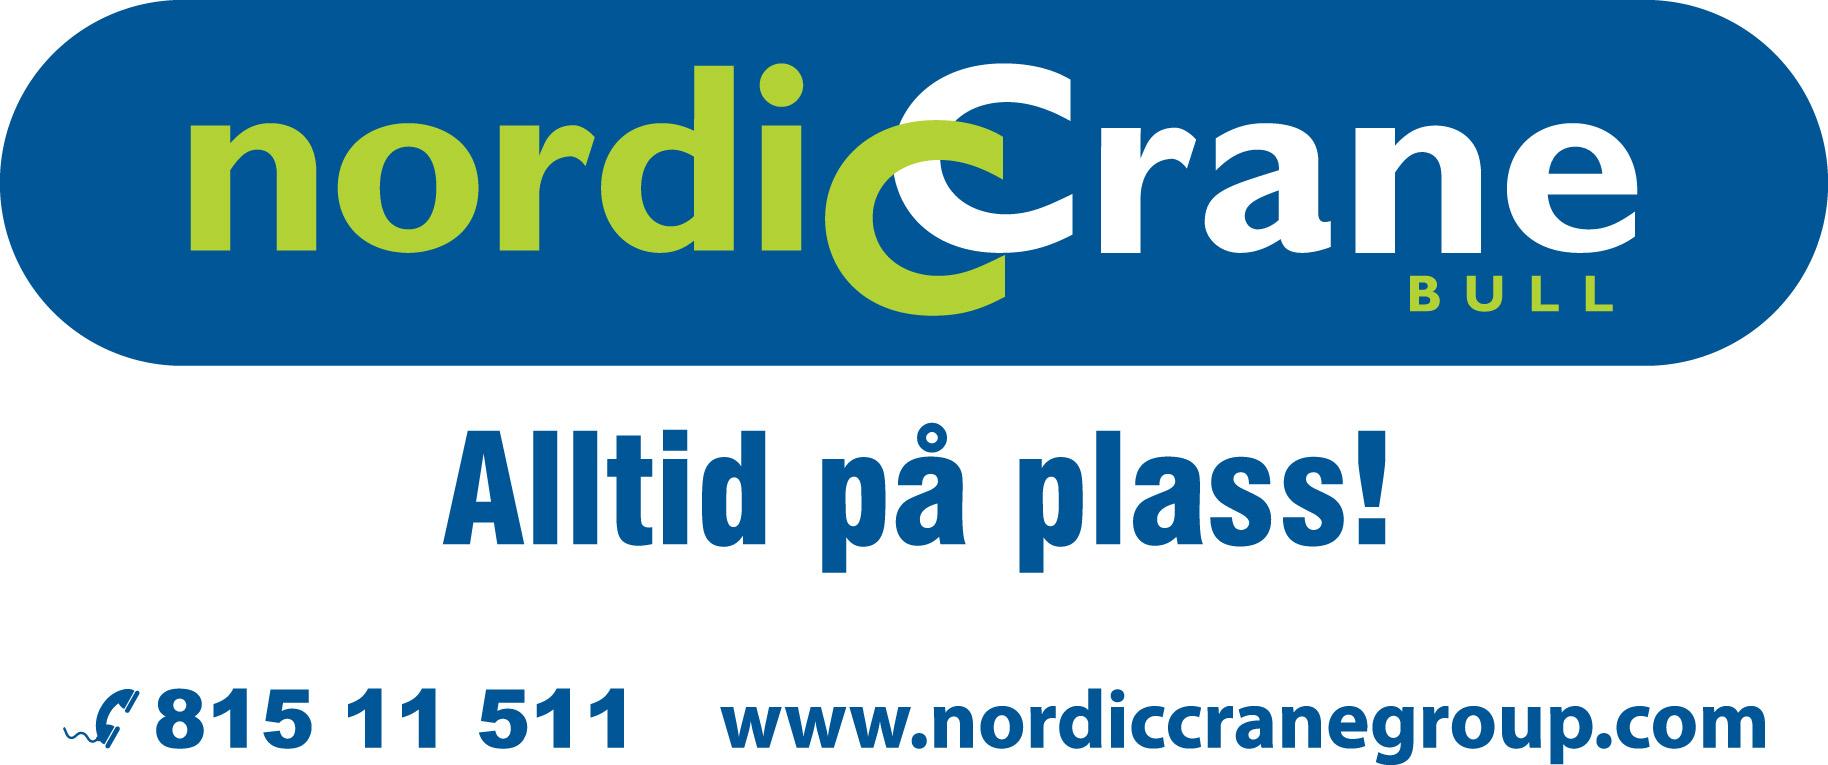 Nordic Crane Bull Banner2